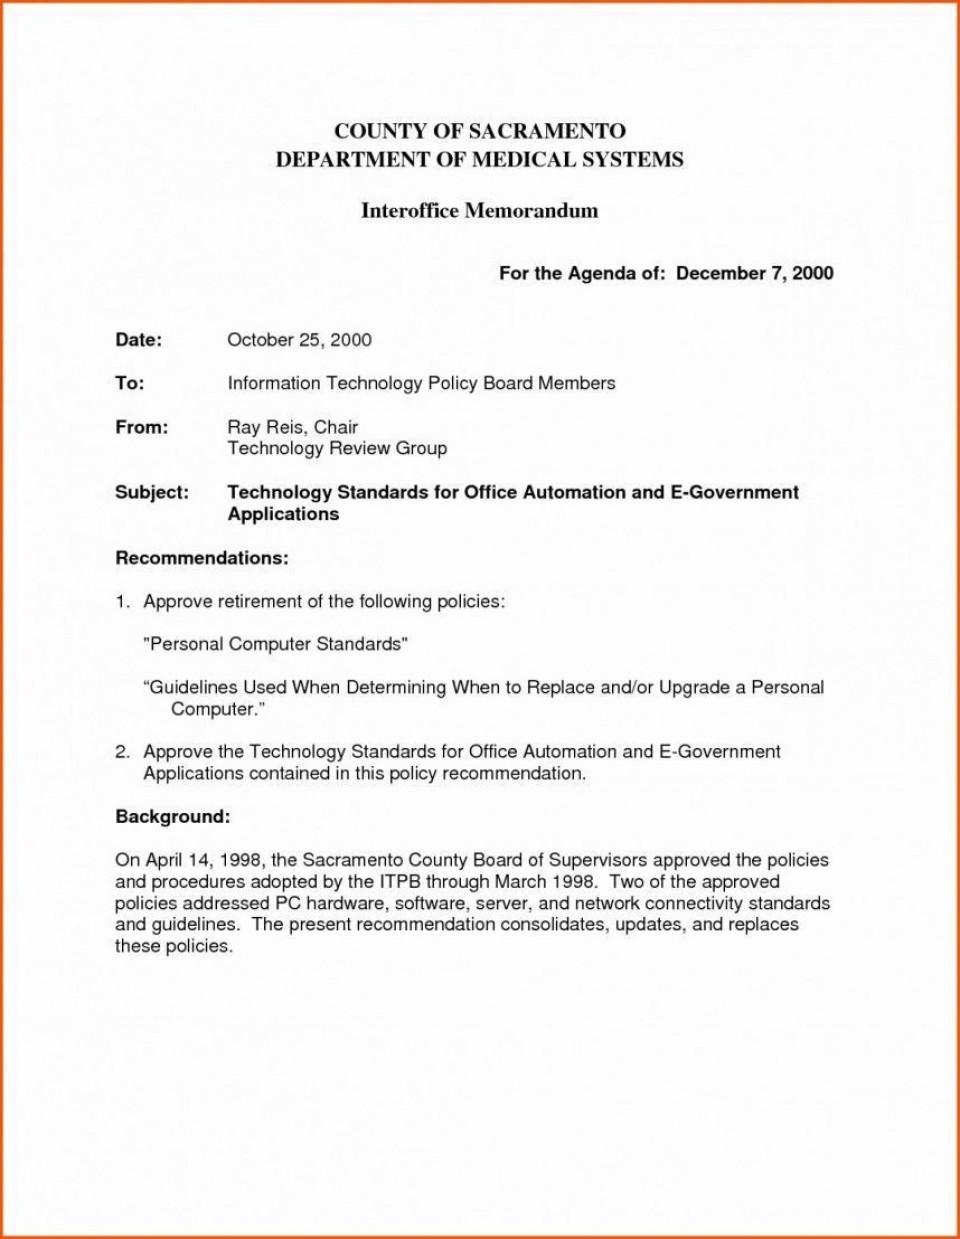 006 Impressive Microsoft Word Professional Memorandum Template Concept  Memo960